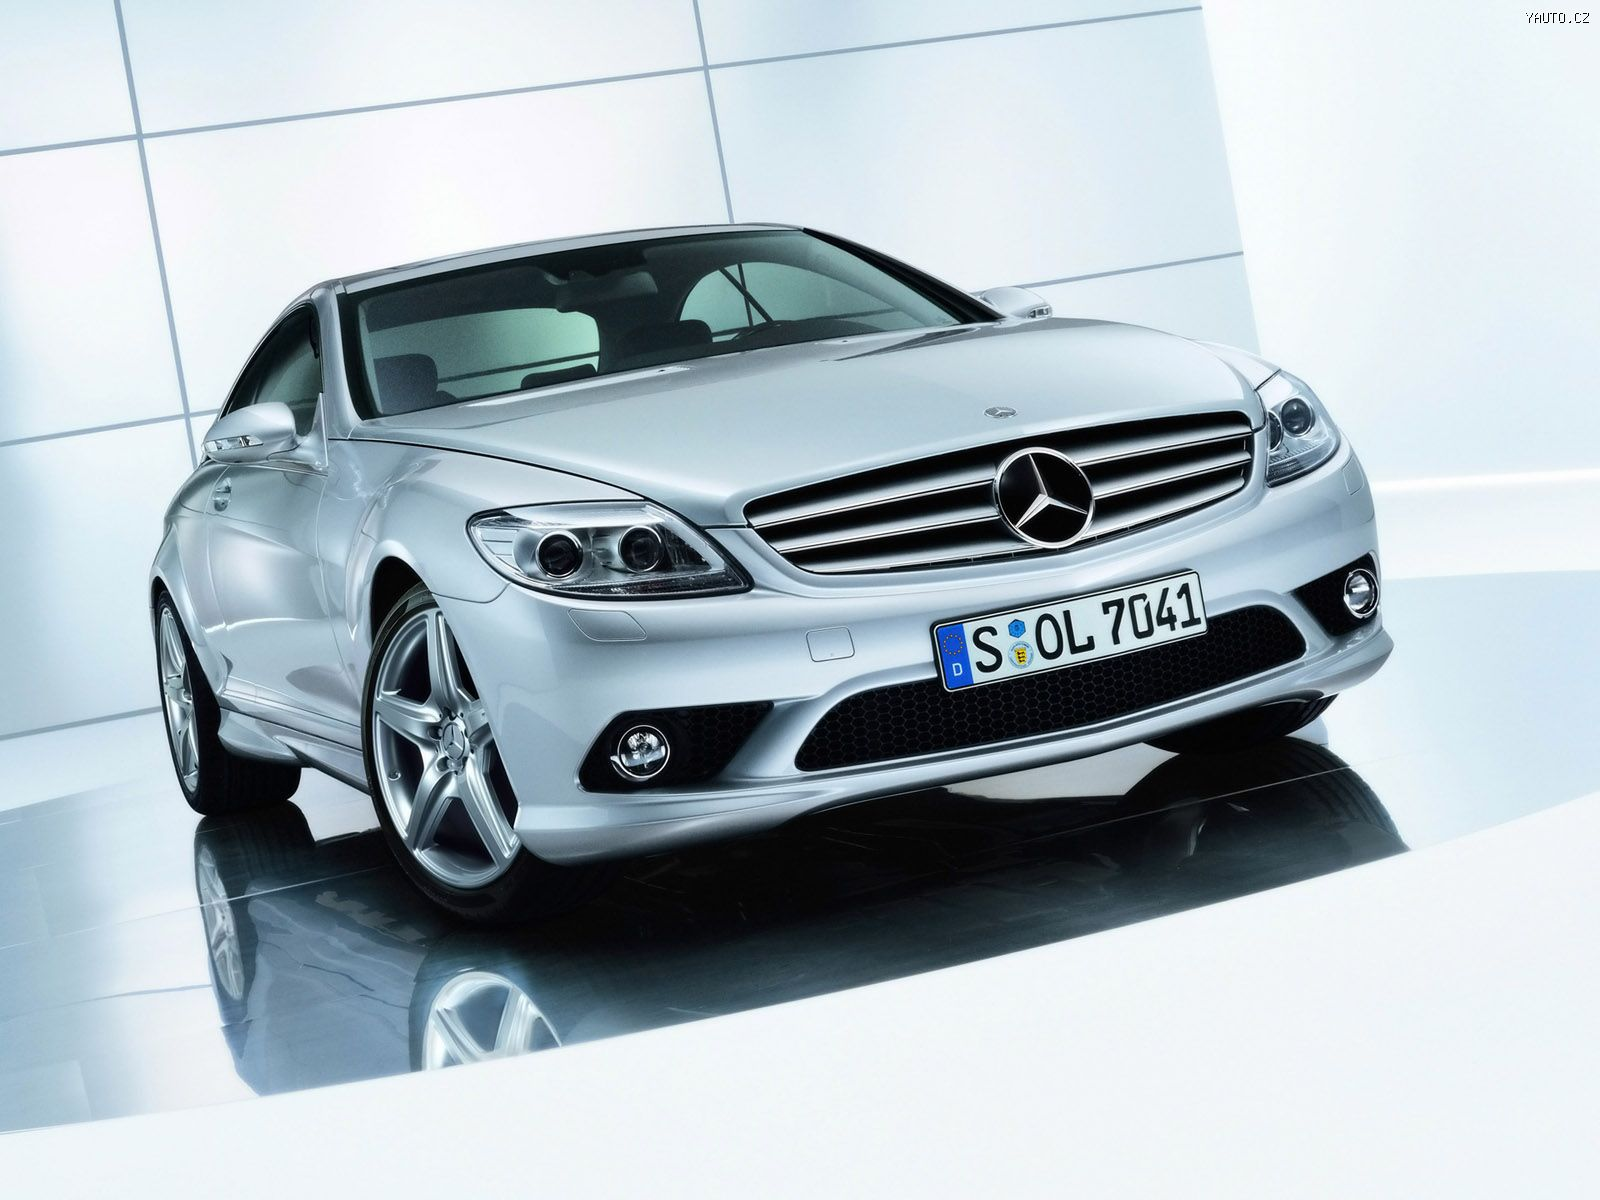 http://img.yauto.cz/tapety/Mercedes_Benz_CL_500_2006_2.jpg